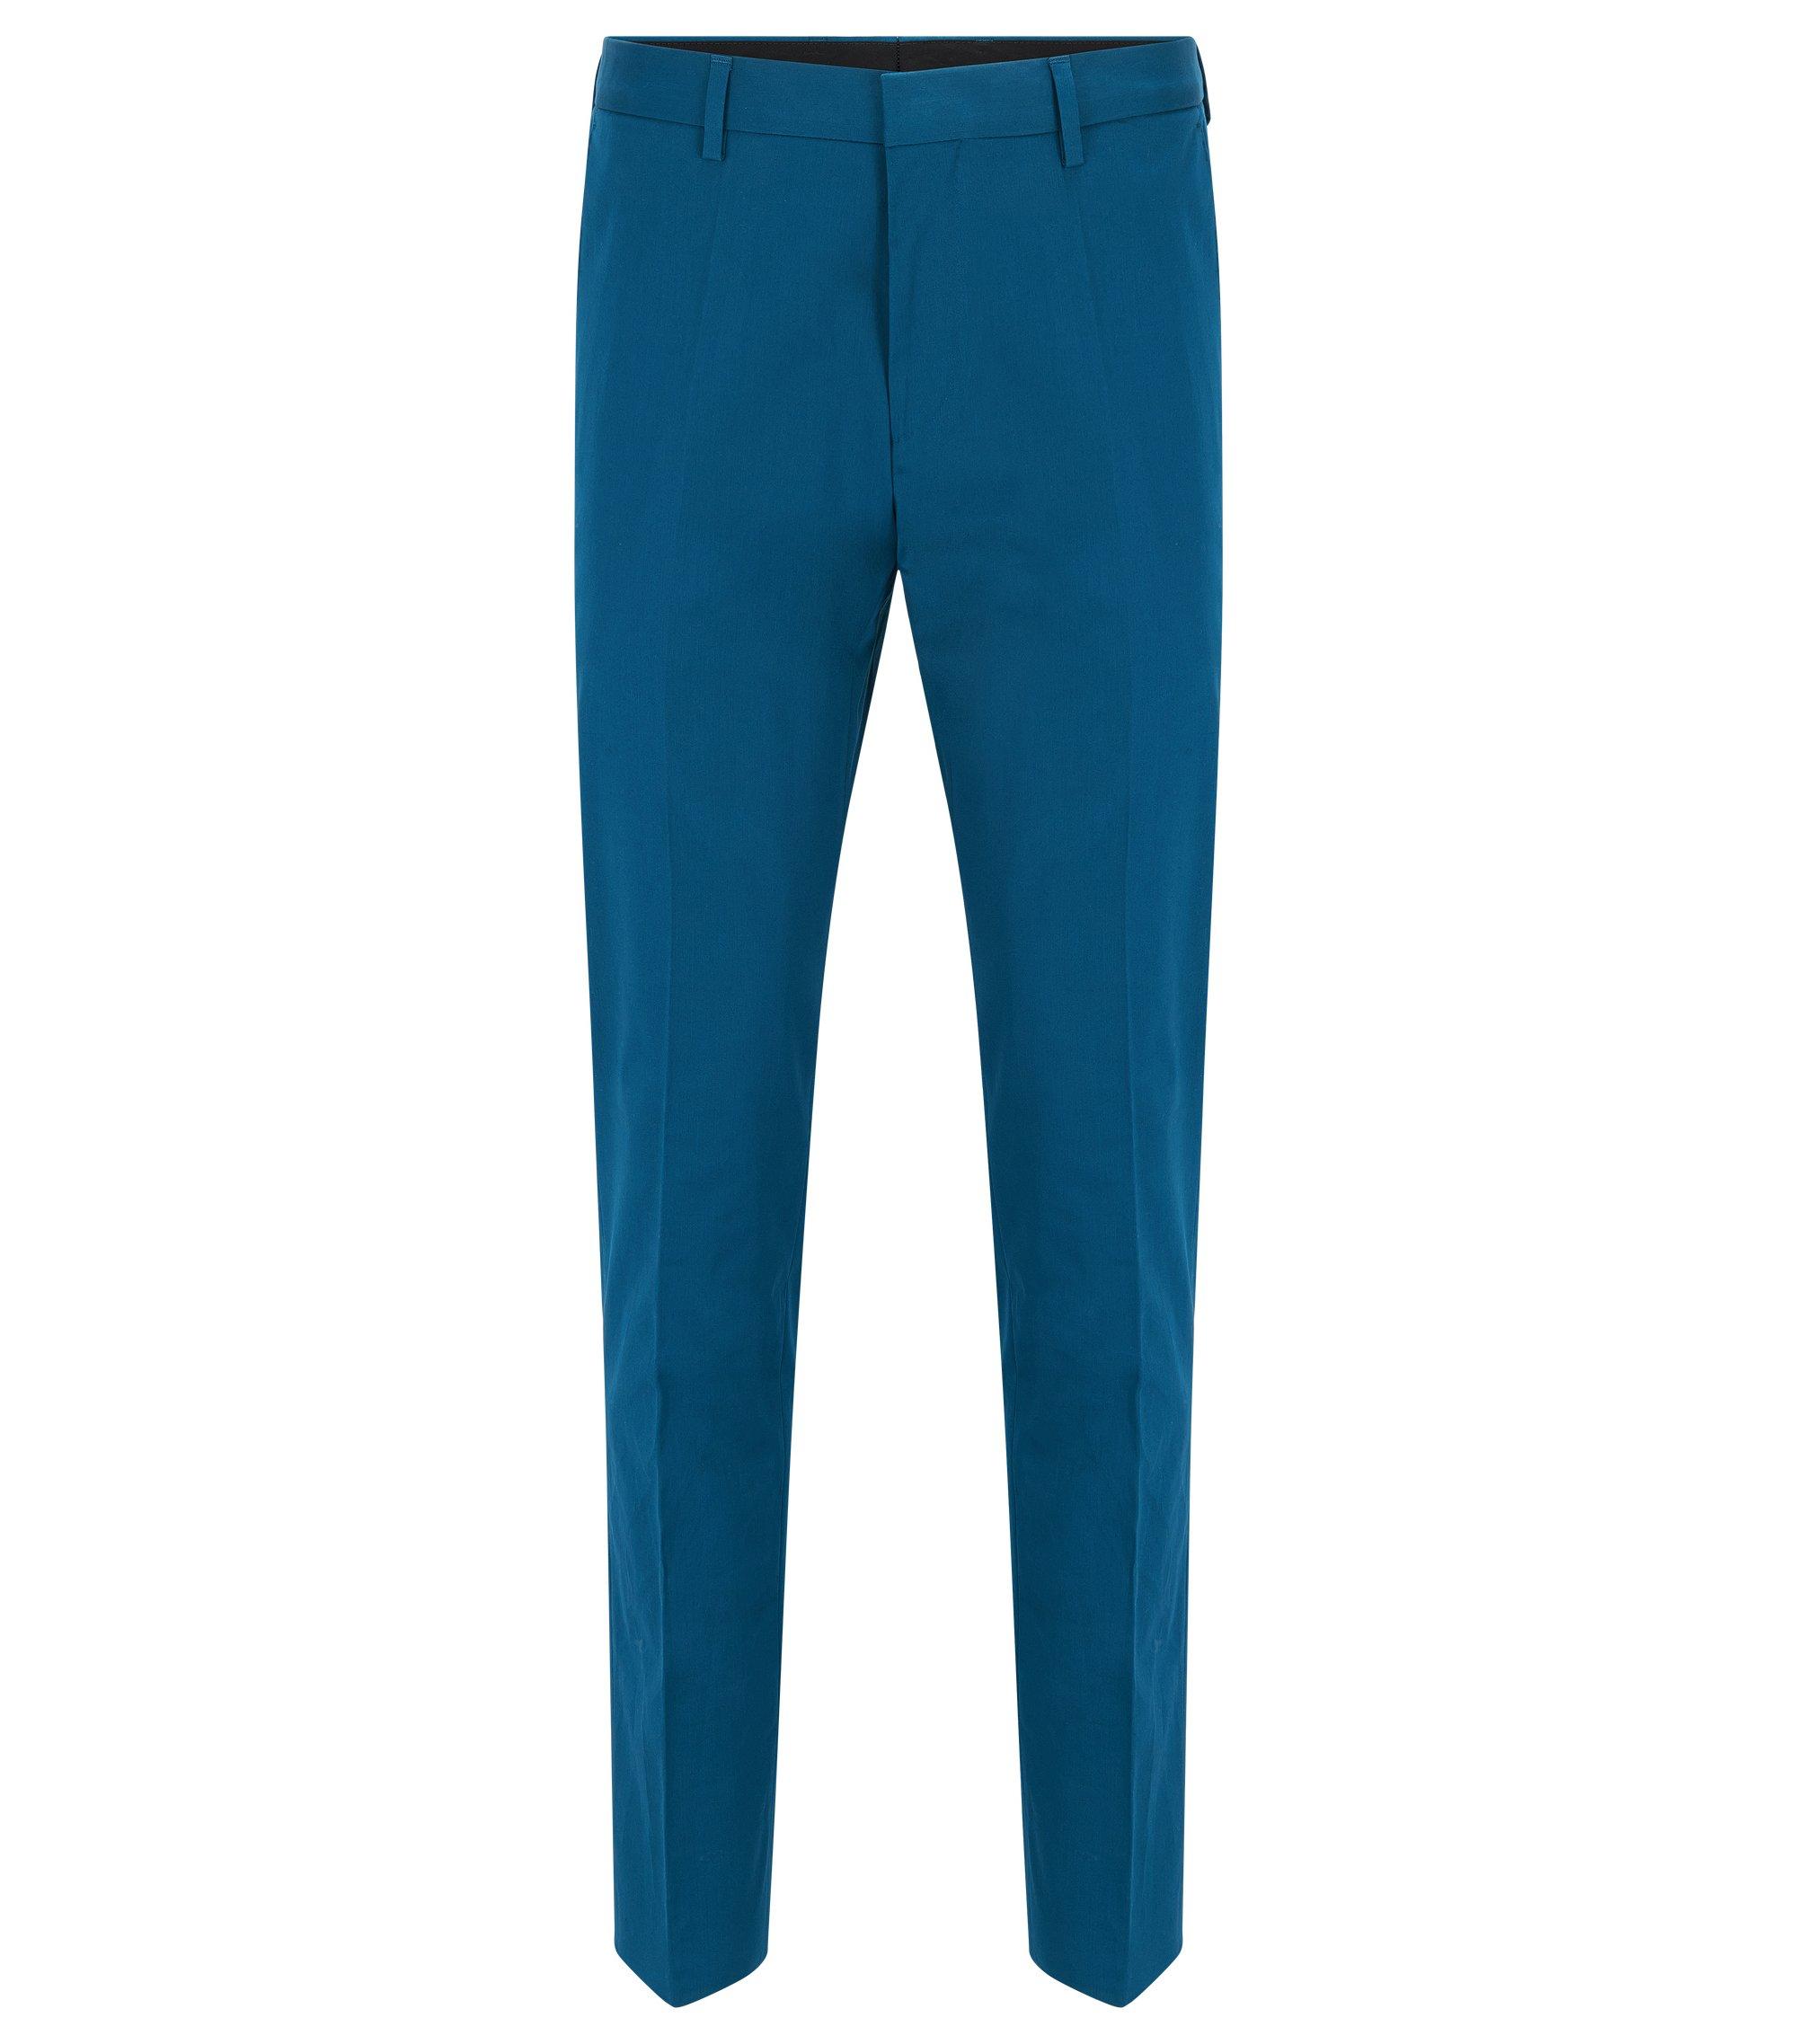 Stretch Cotton Dress Pant, Slim Fit   Genesis, Turquoise